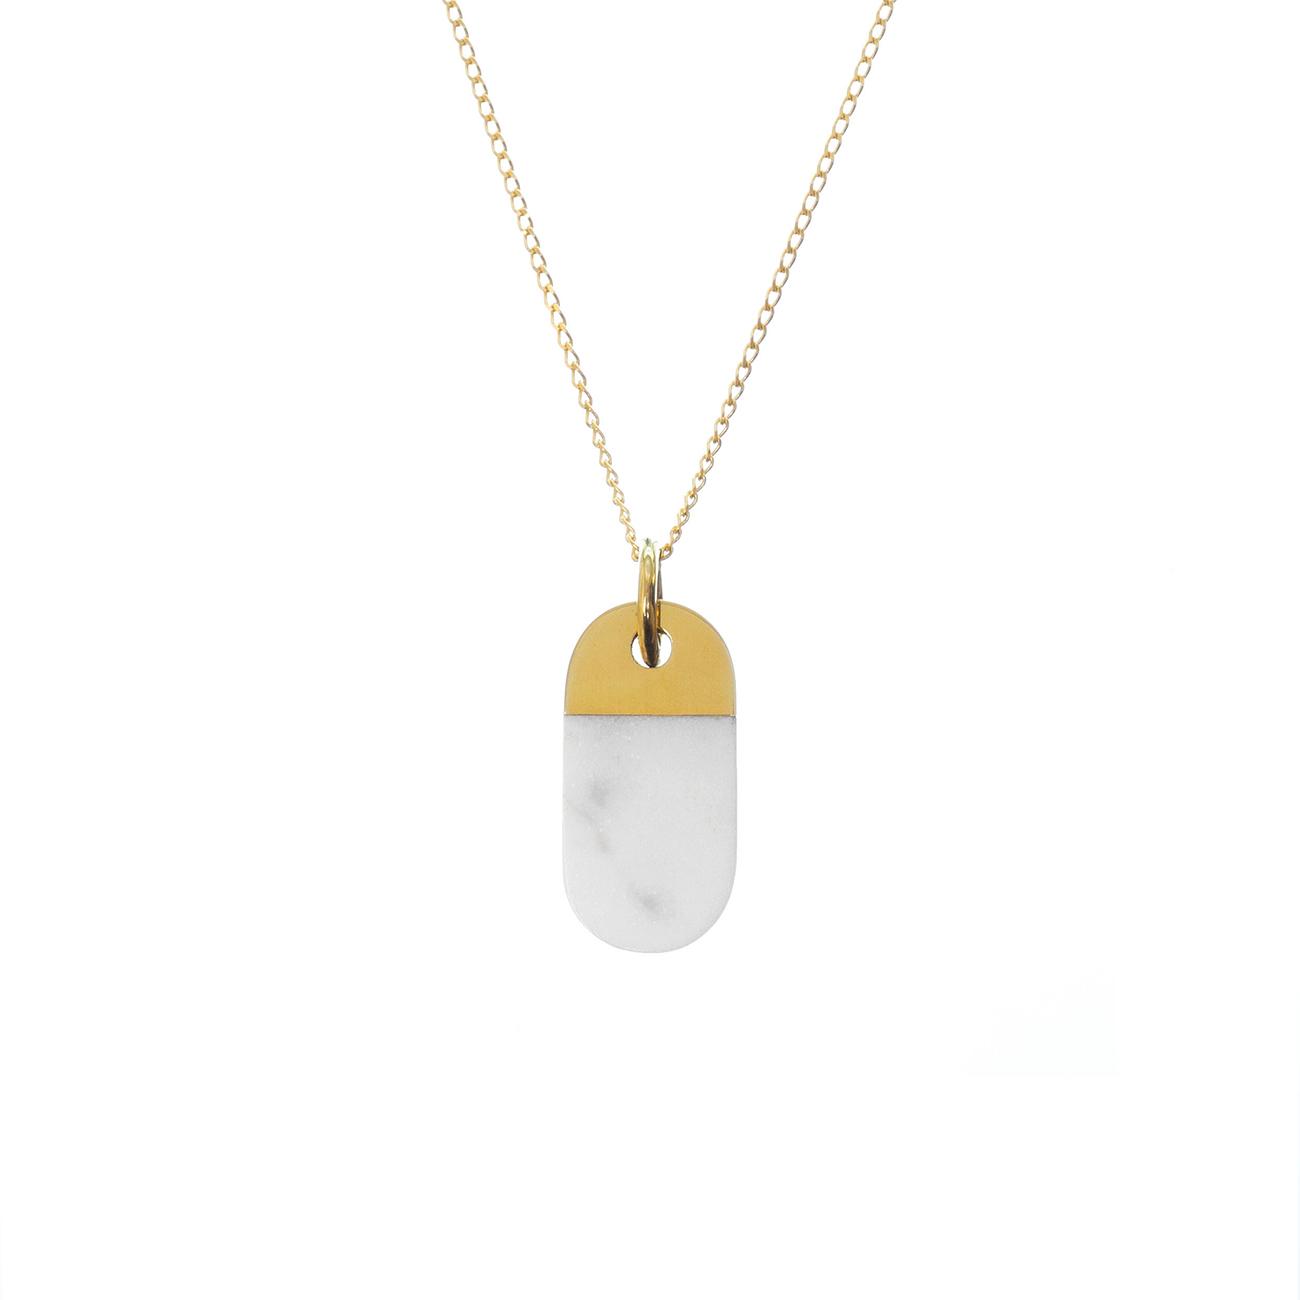 metaformi_design_jewelry_split_oval_necklace_bianco